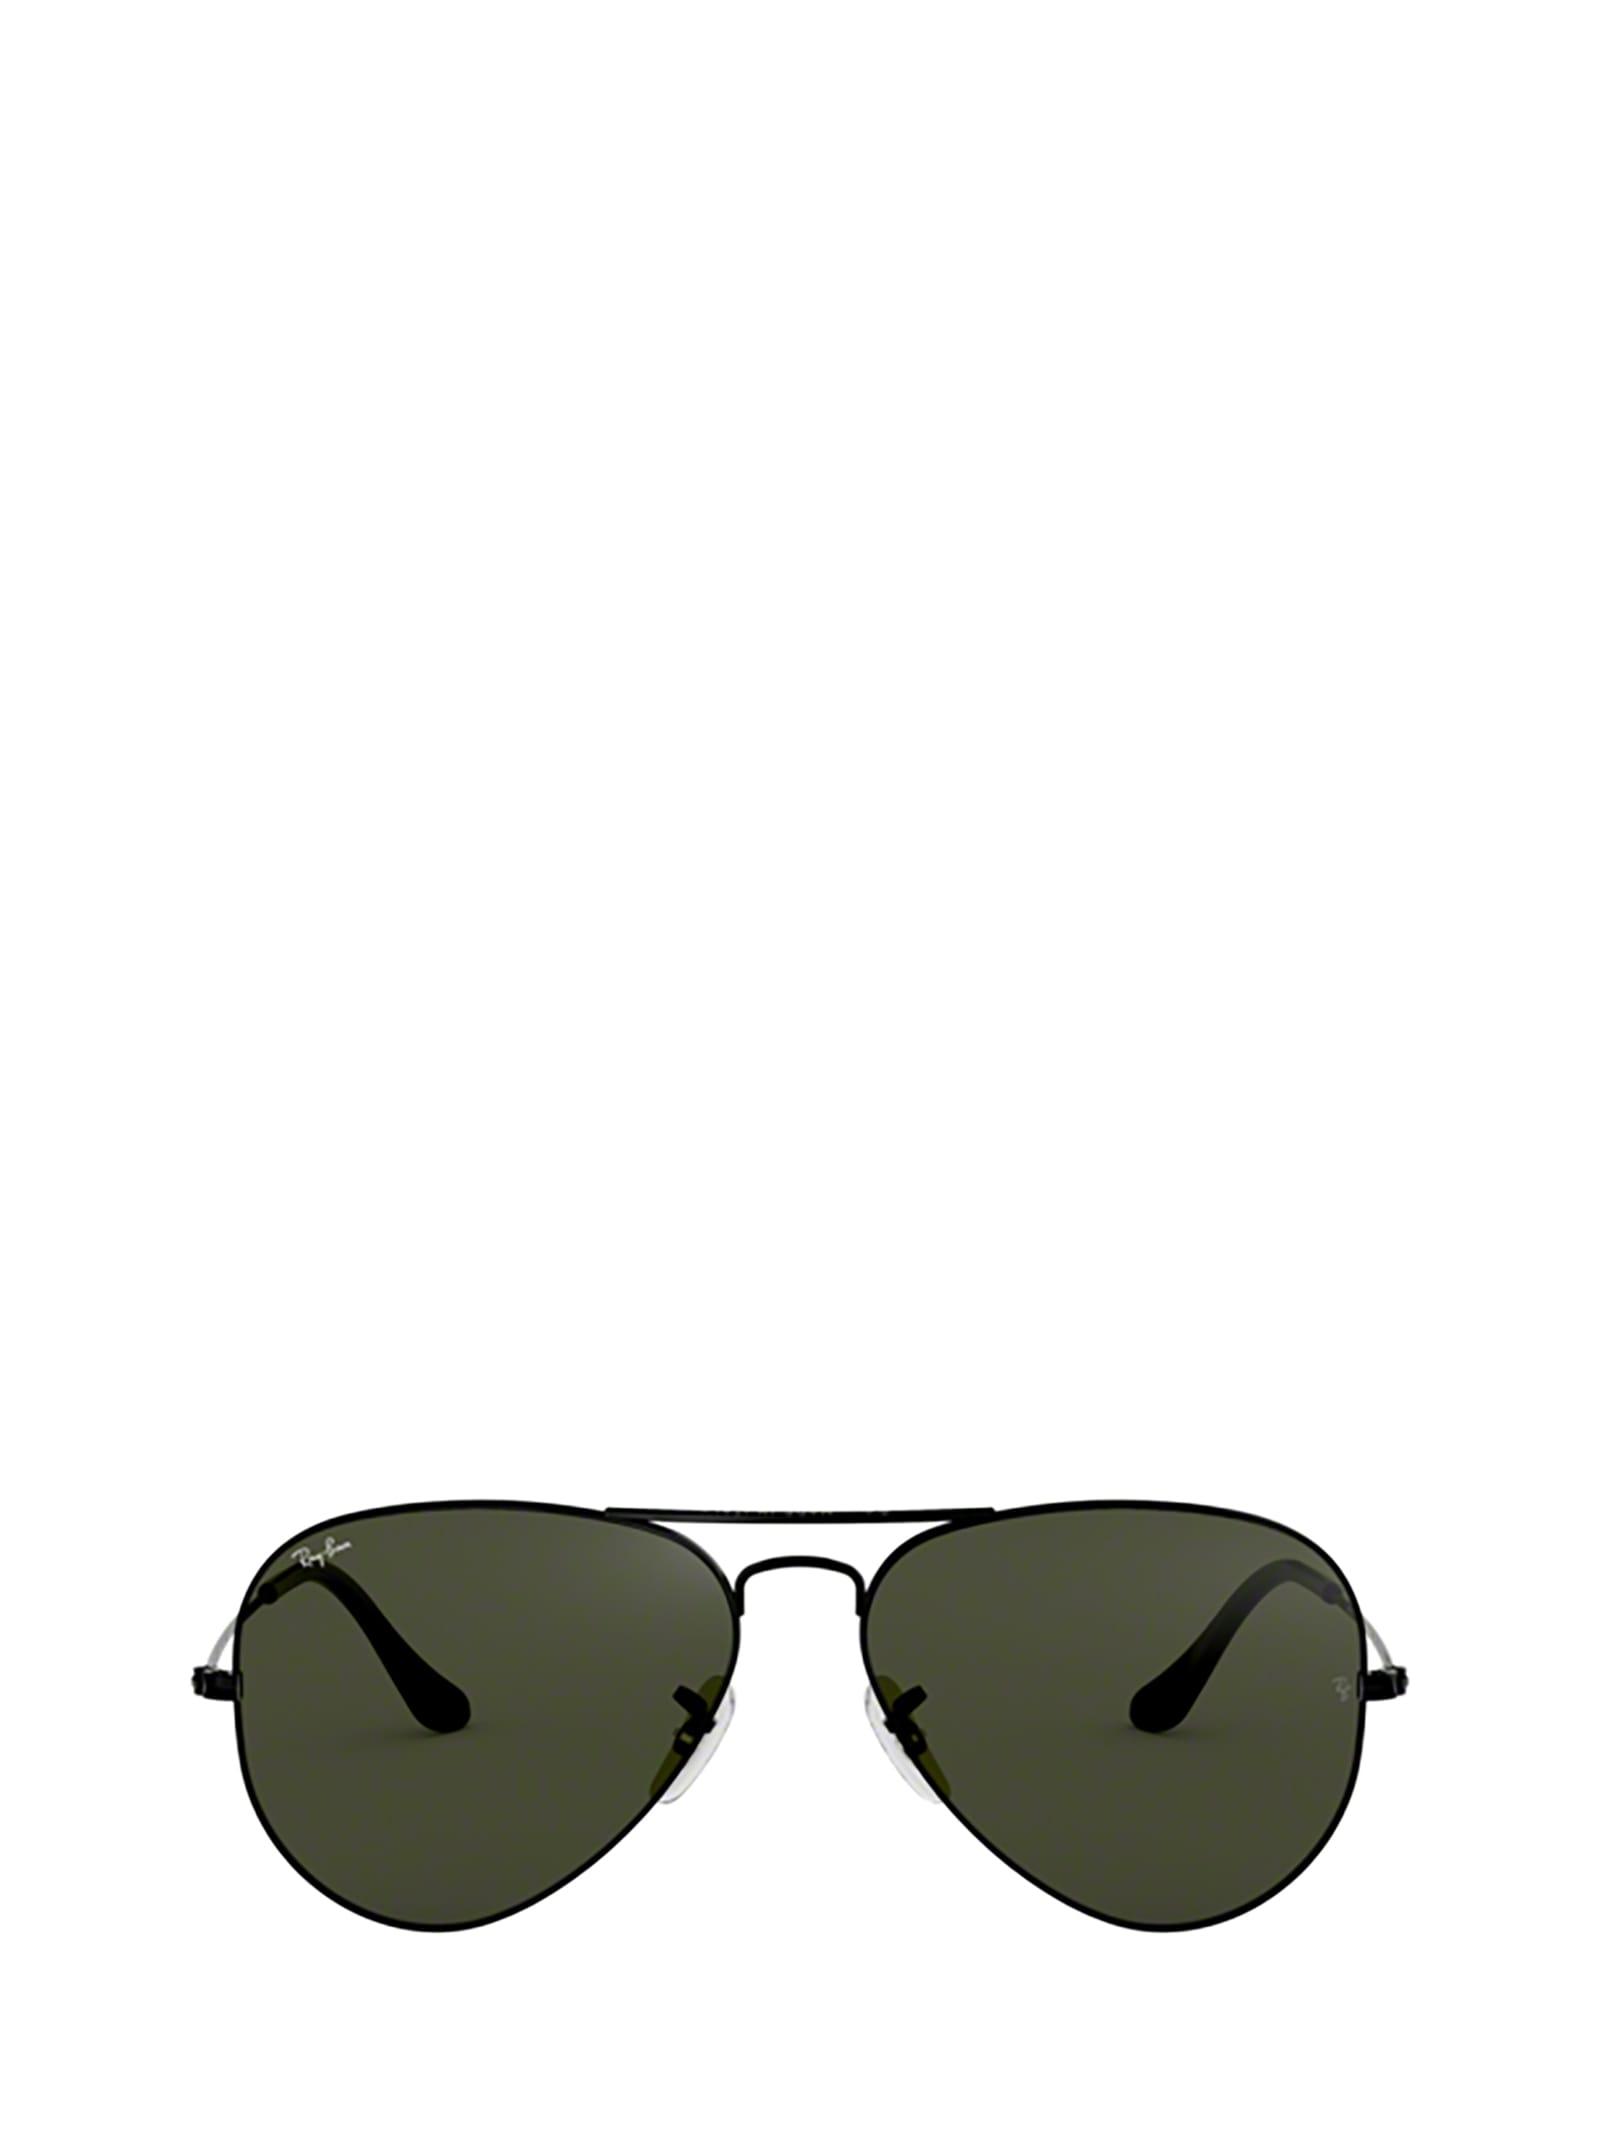 Ray-Ban Ray-ban Rb3025 Black Sunglasses